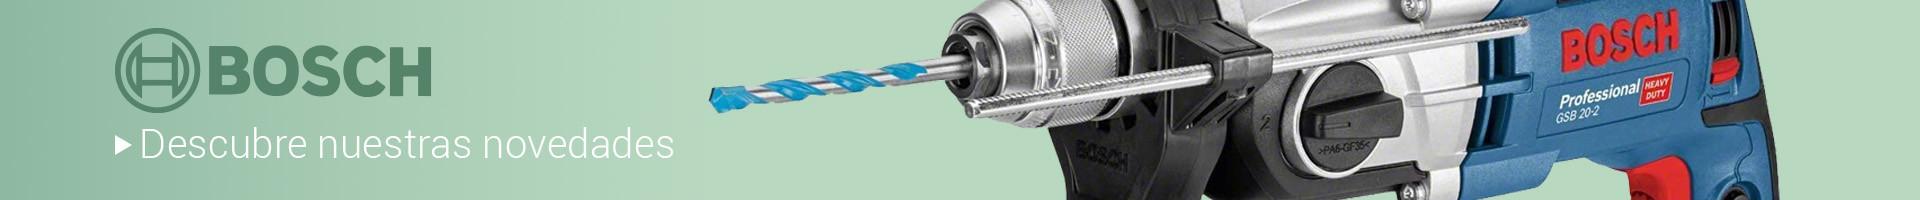 Bosch Professional   Herramientas hasta -25% dto